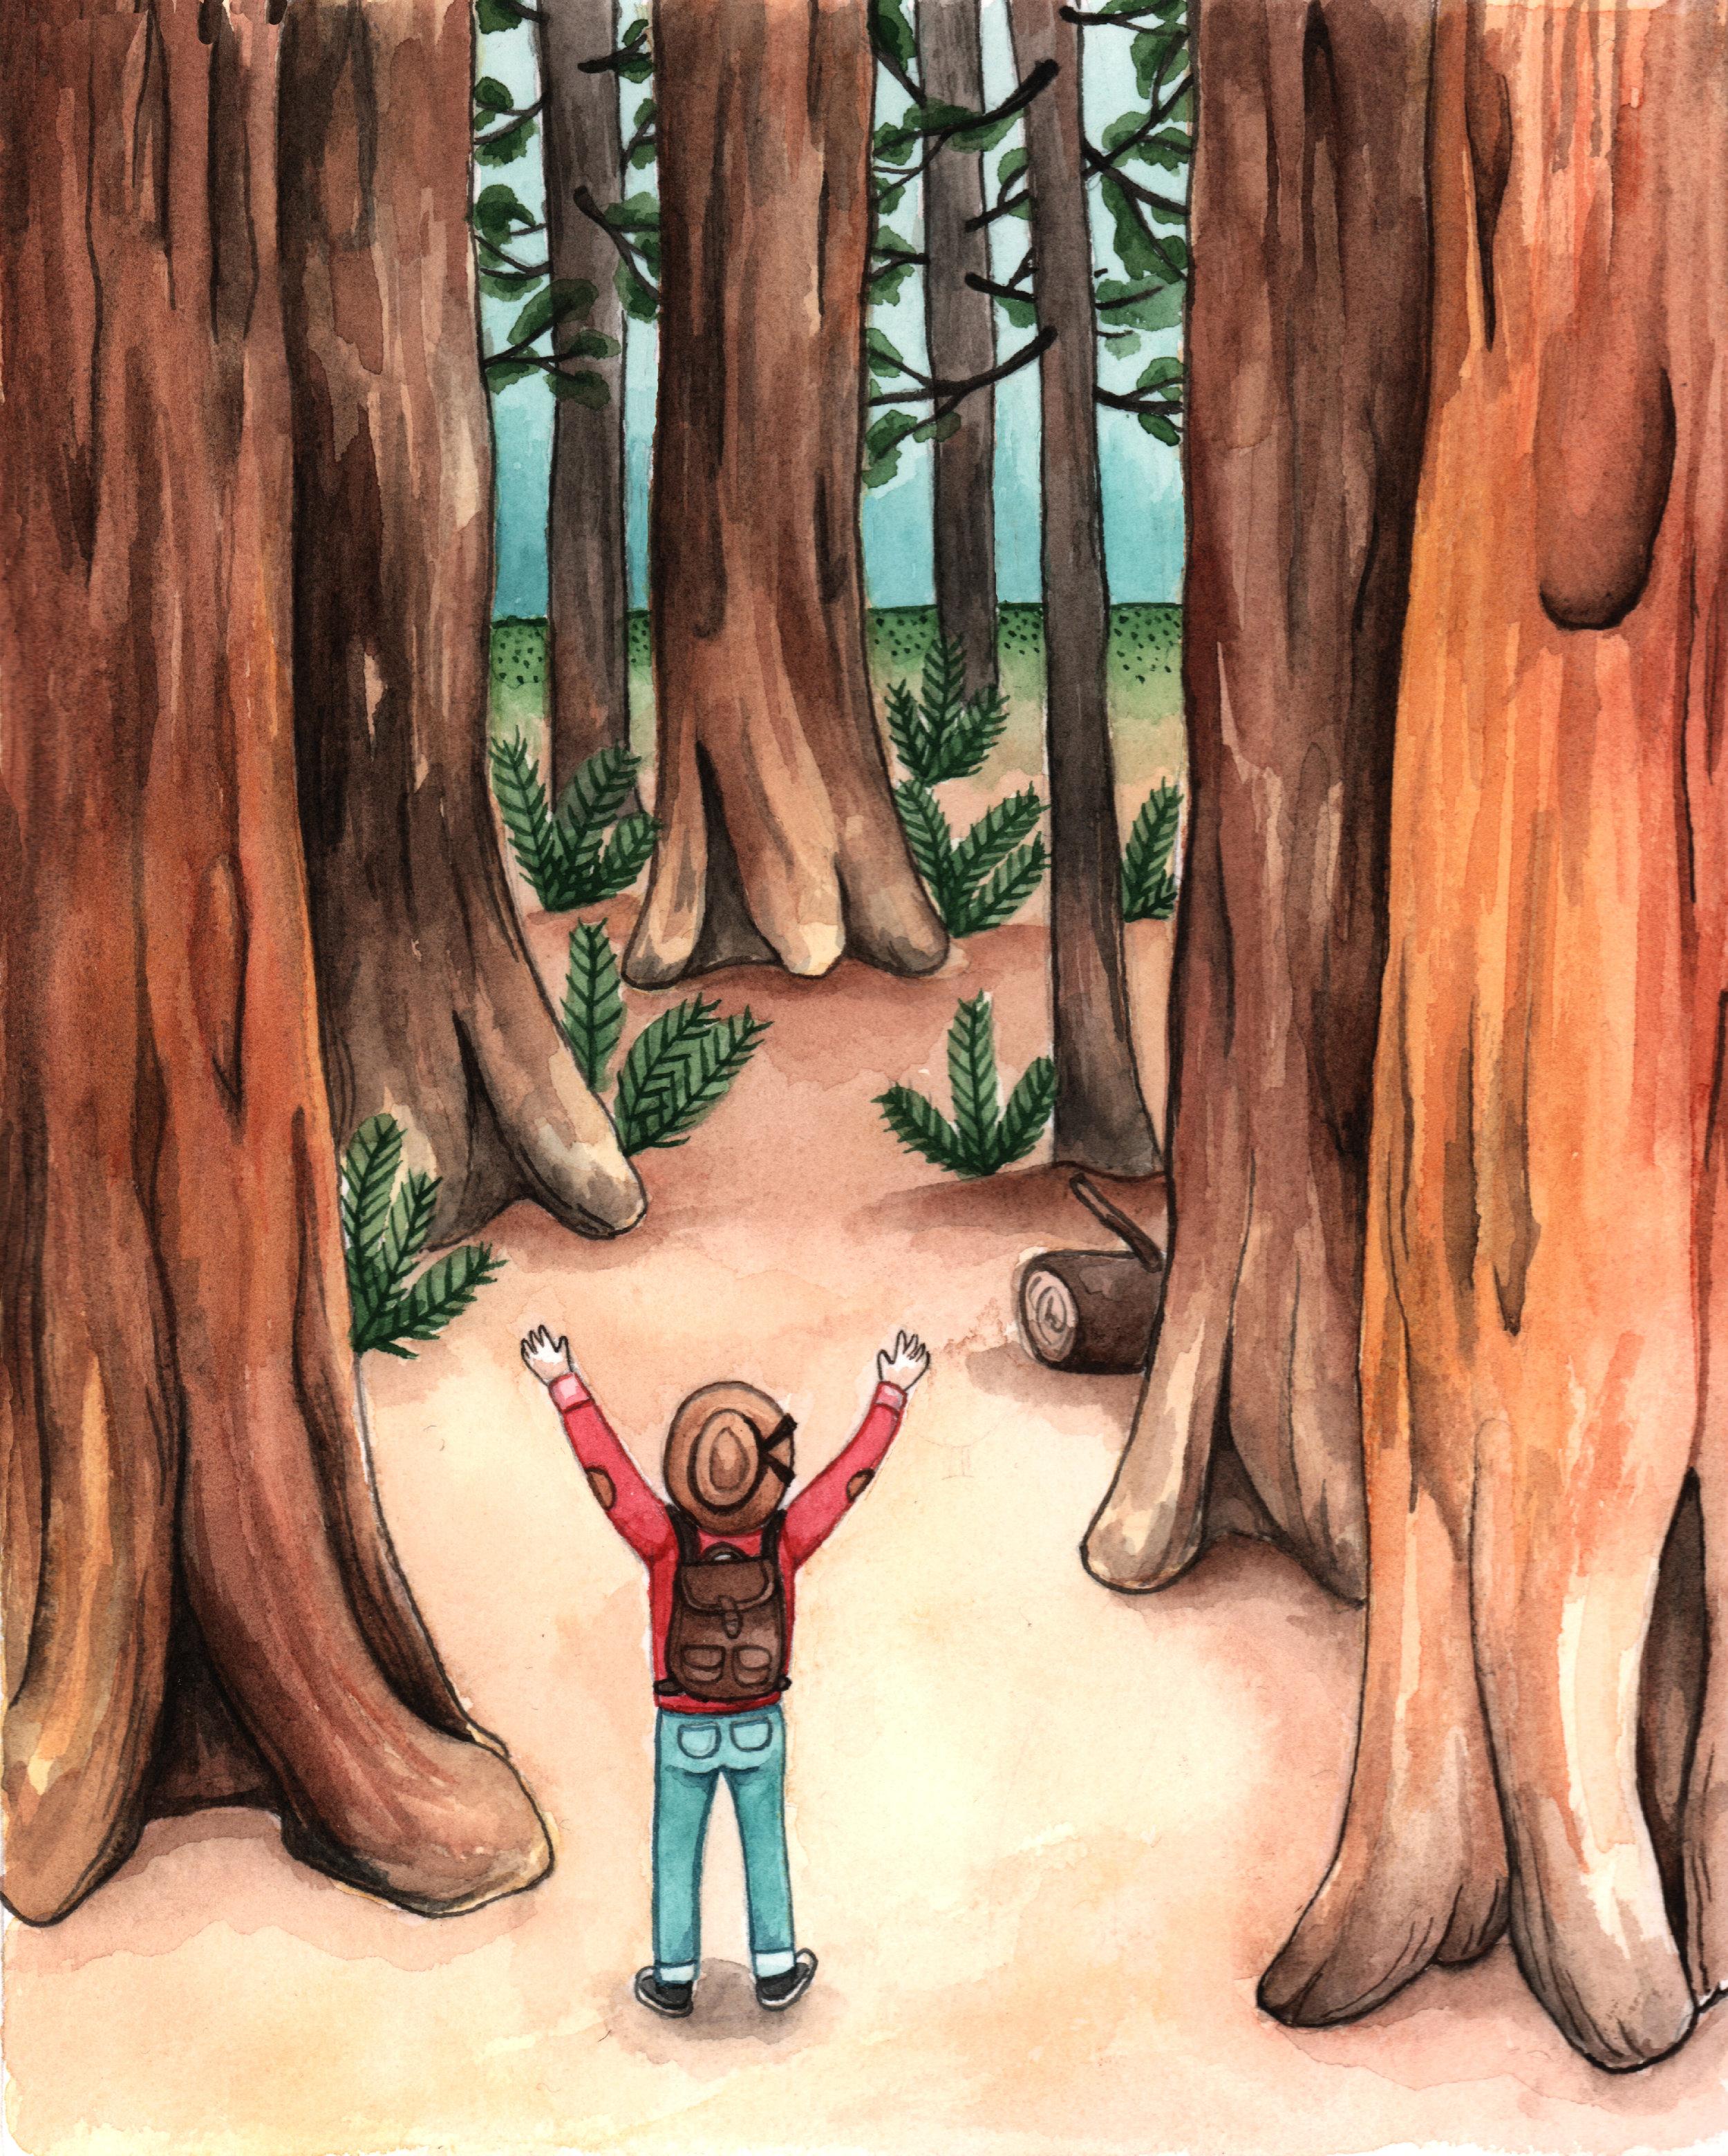 redwoods copy 2.jpg